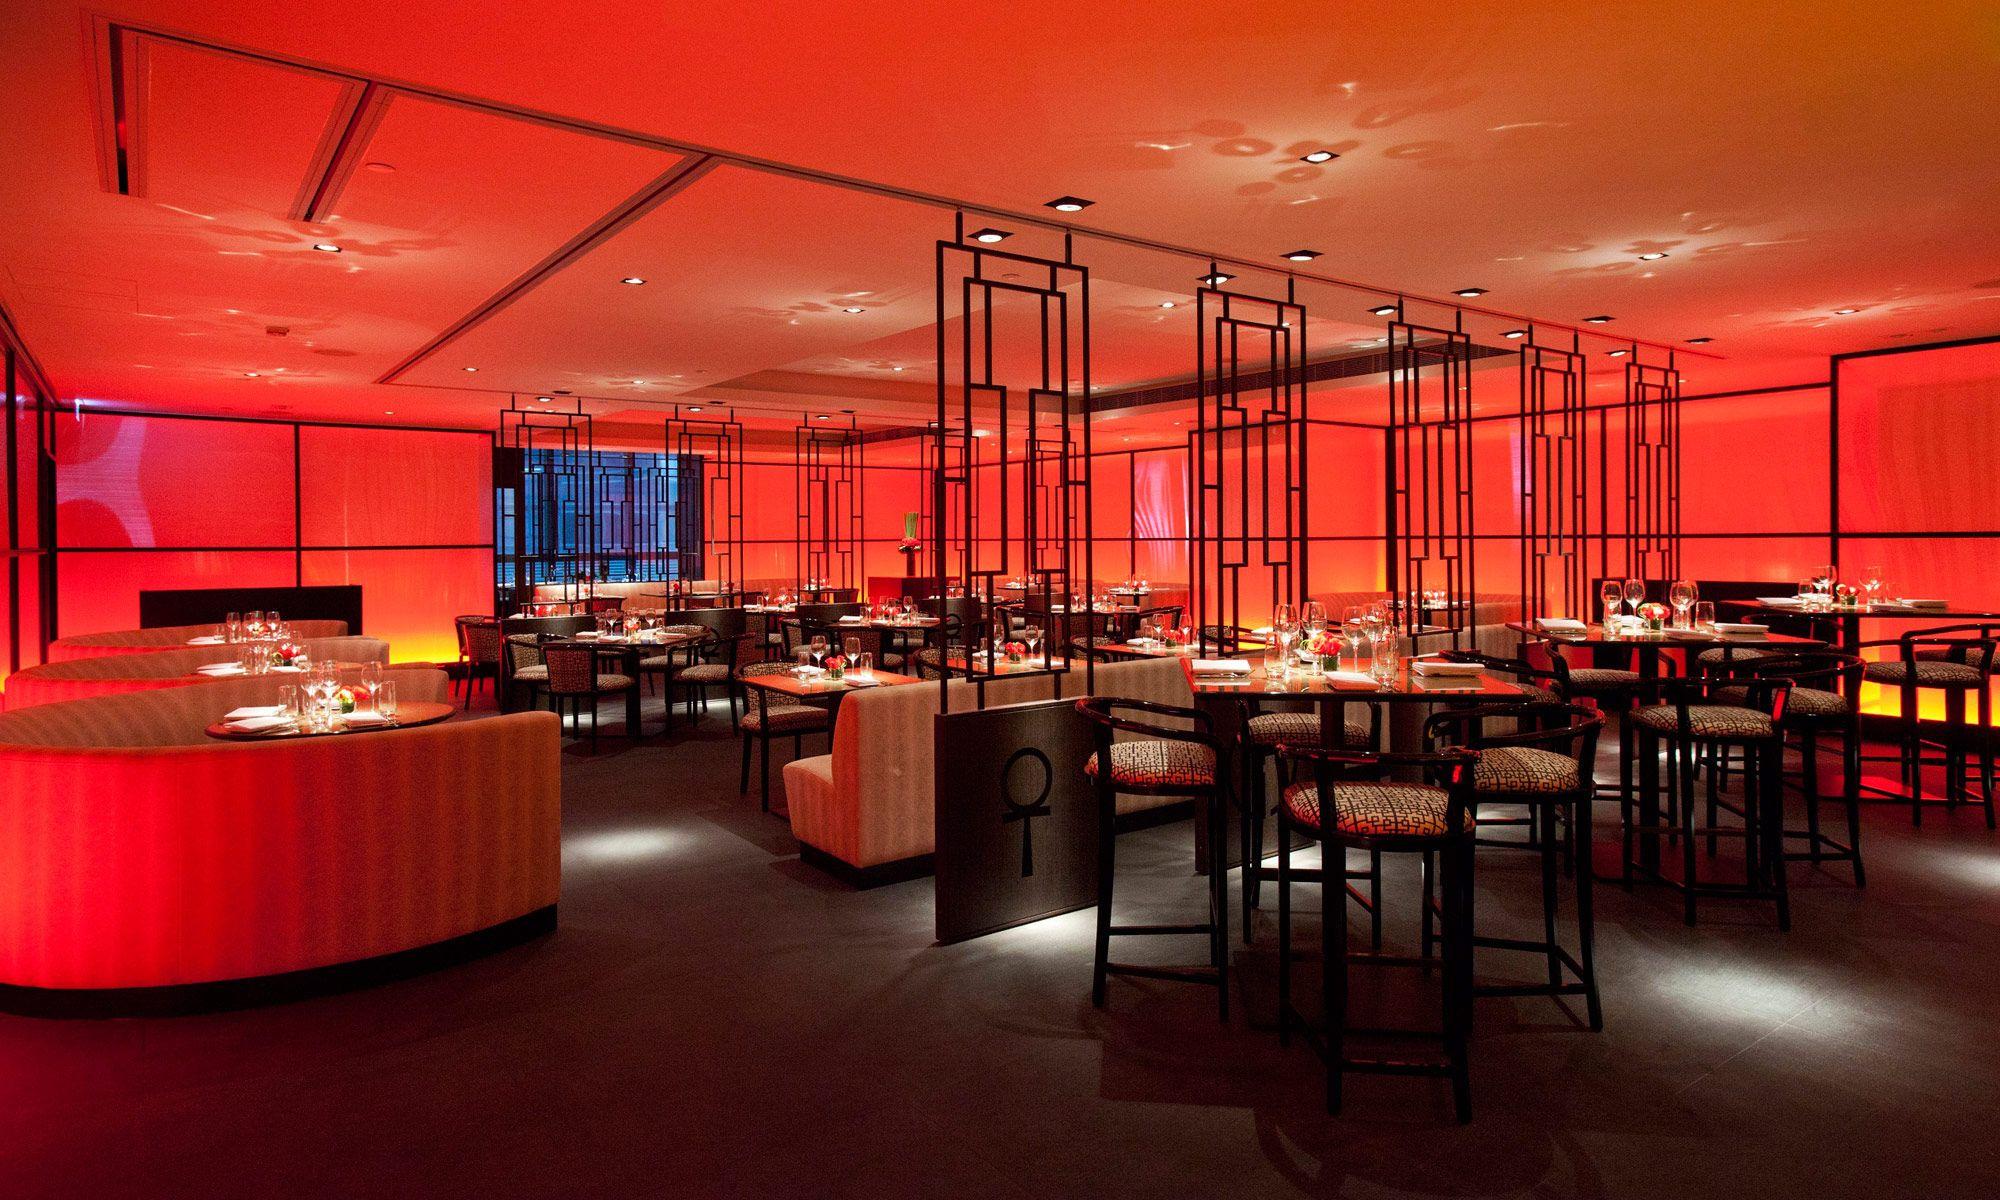 Aqua Restaurant Group's Festive Brunches